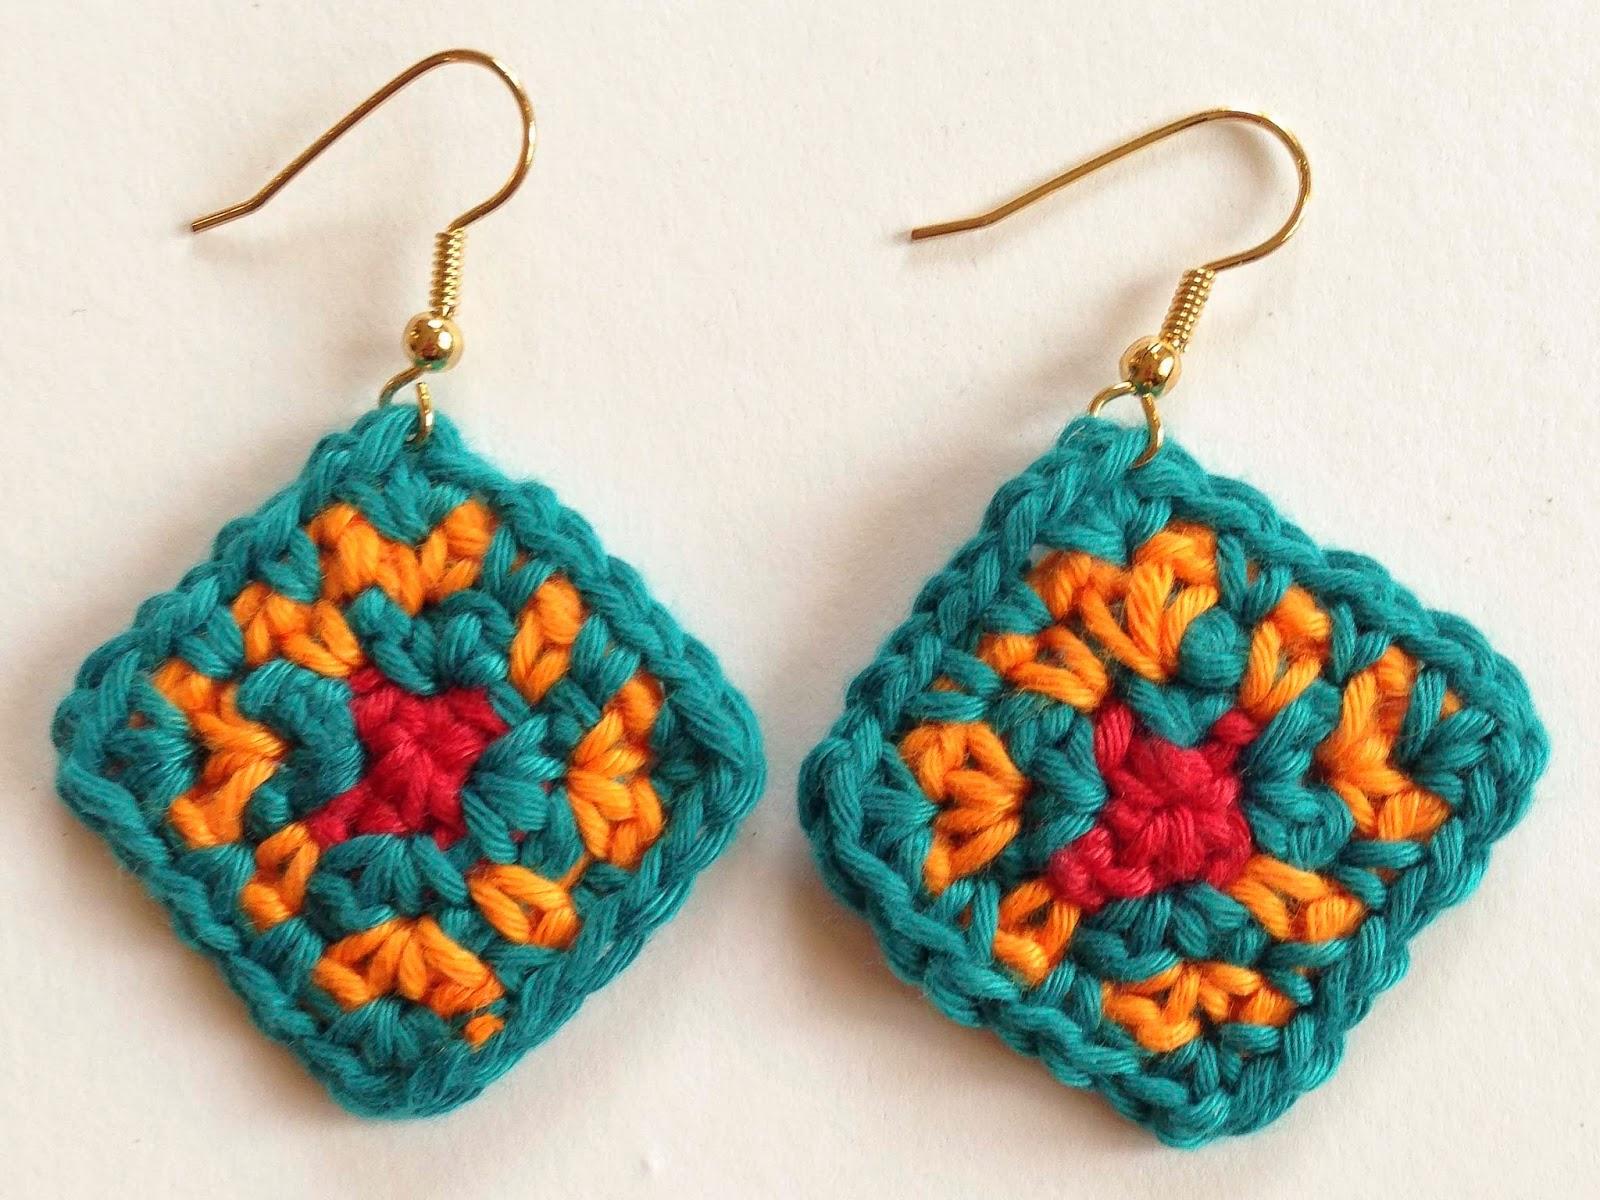 crochet rockstar: The Colors of Africa Crochet Earrings